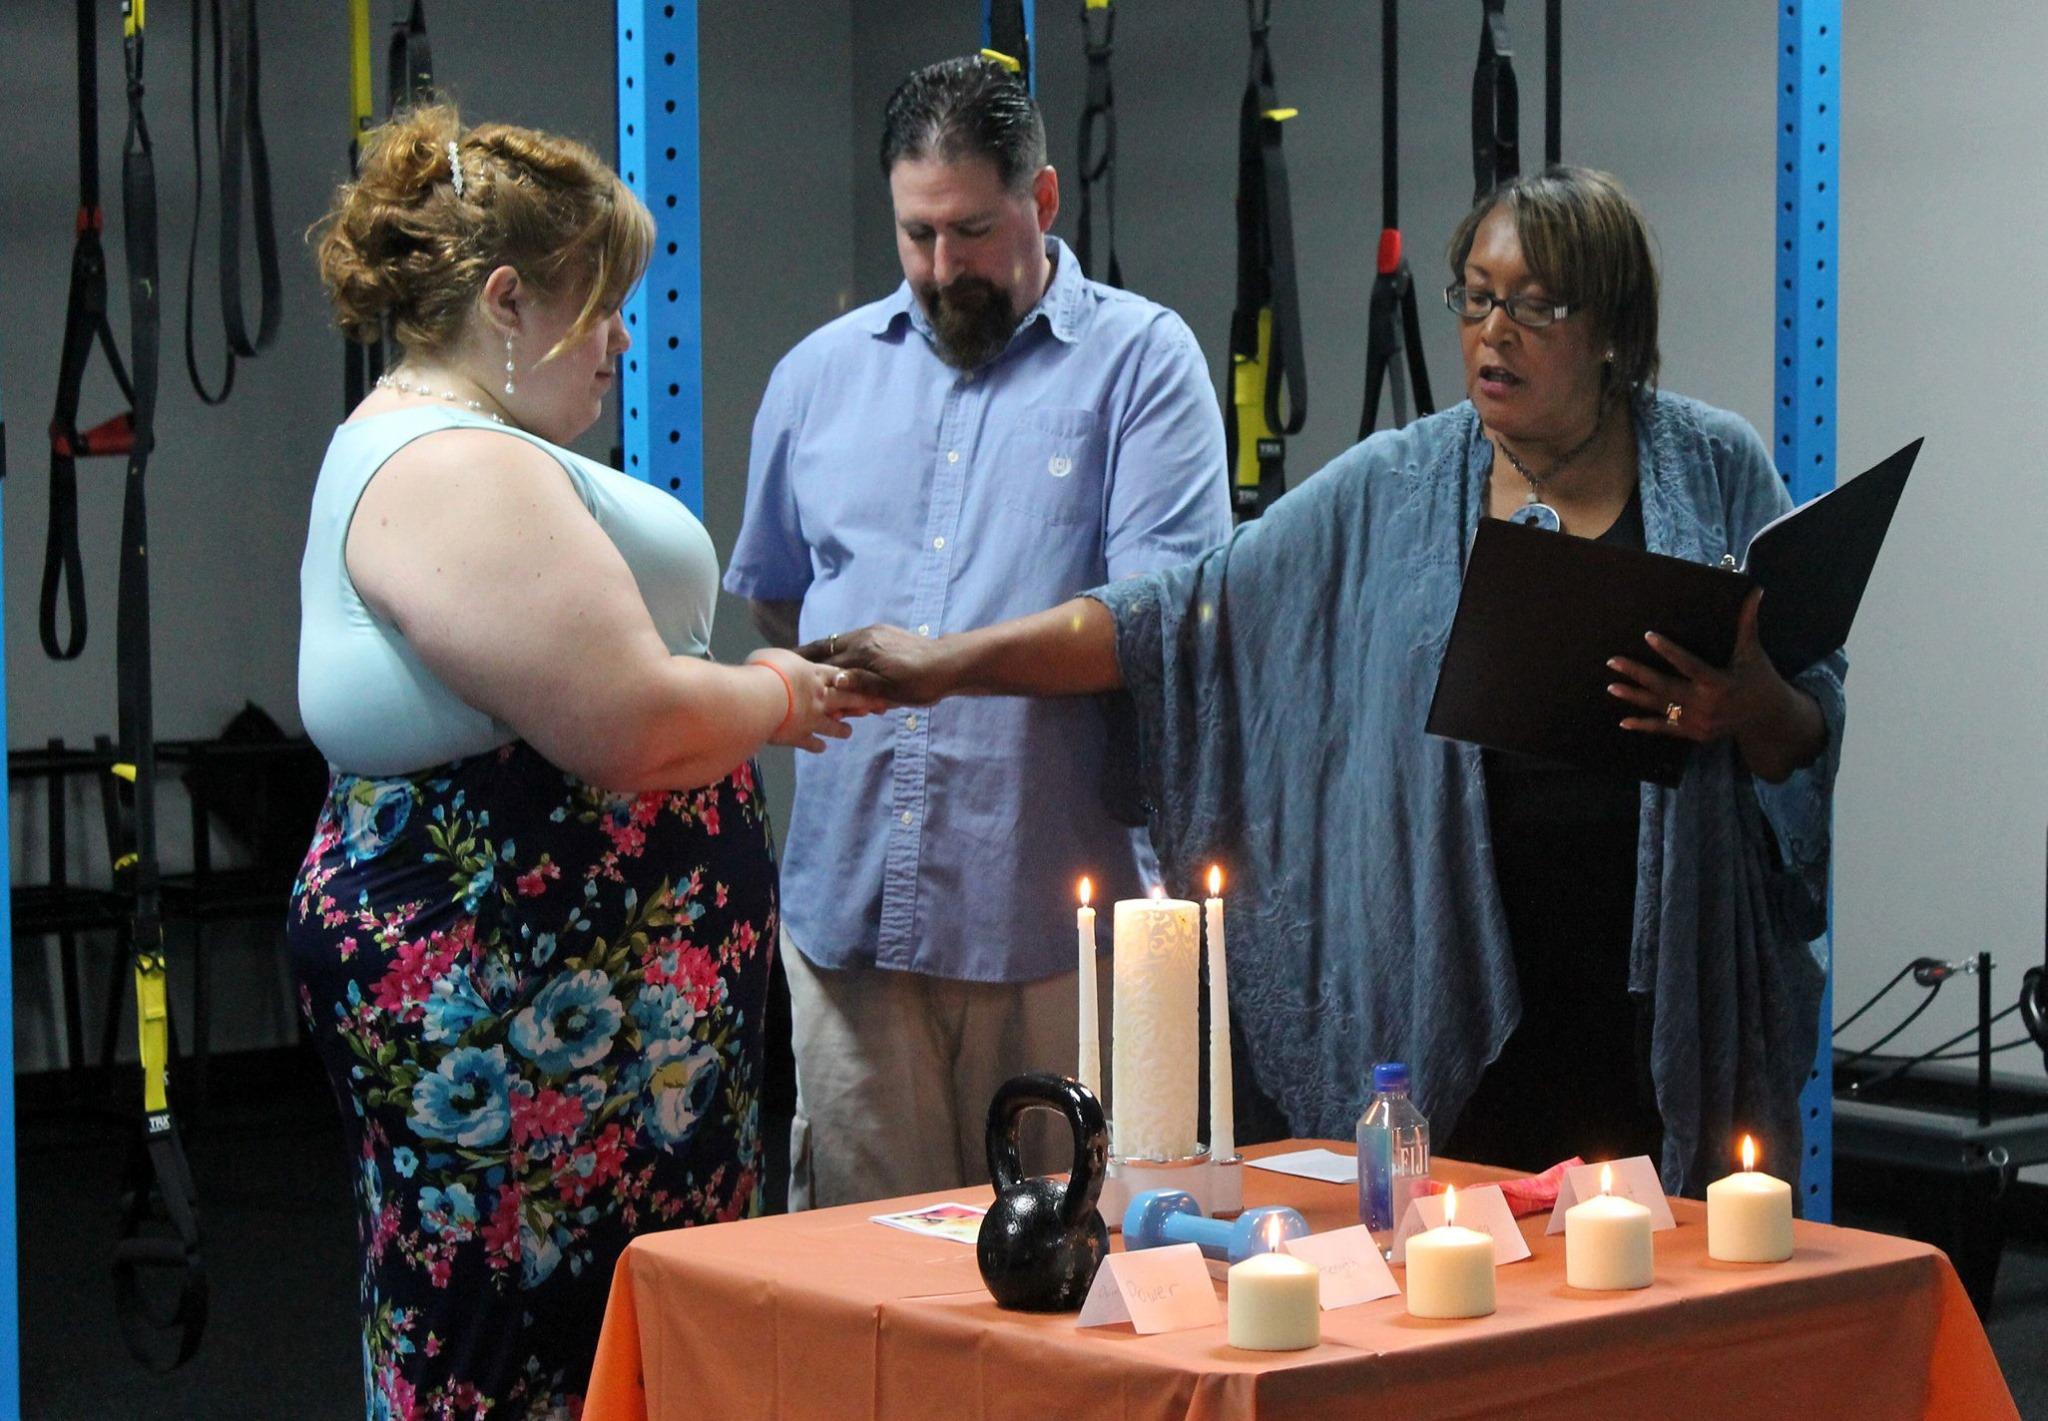 Vowel renewal with wedding celebrant